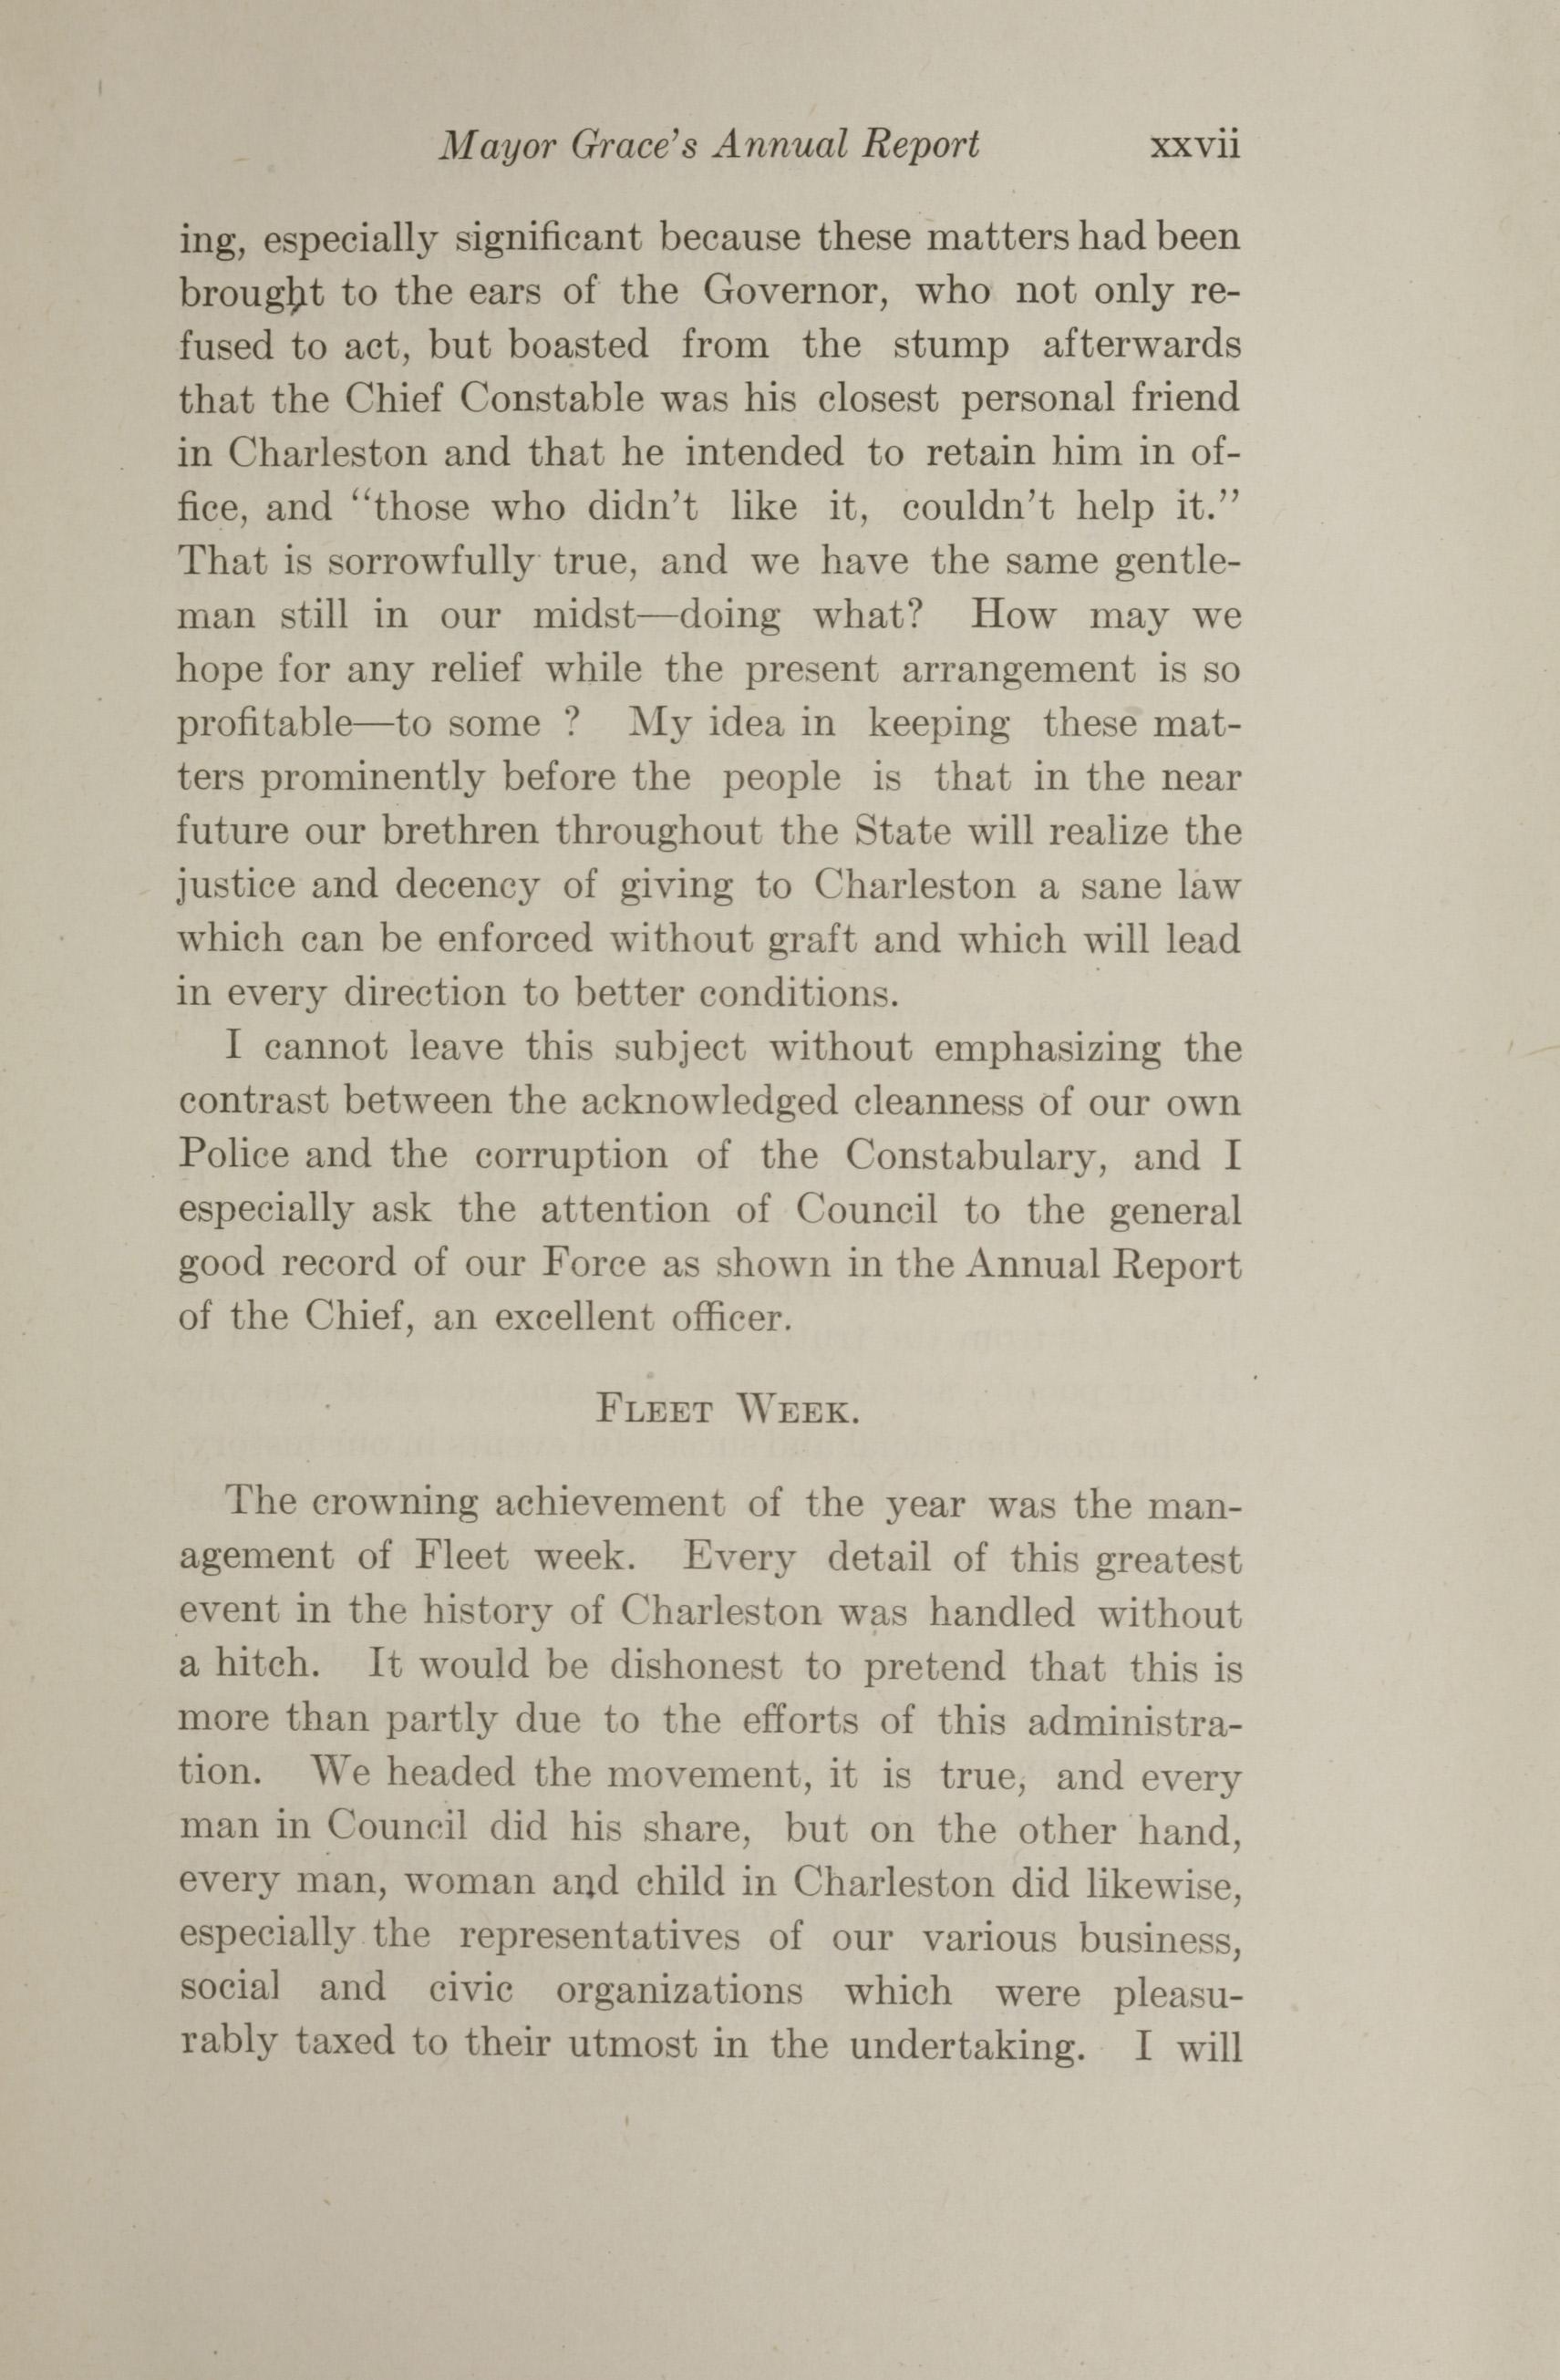 Charleston Yearbook, 1912, page xxvii